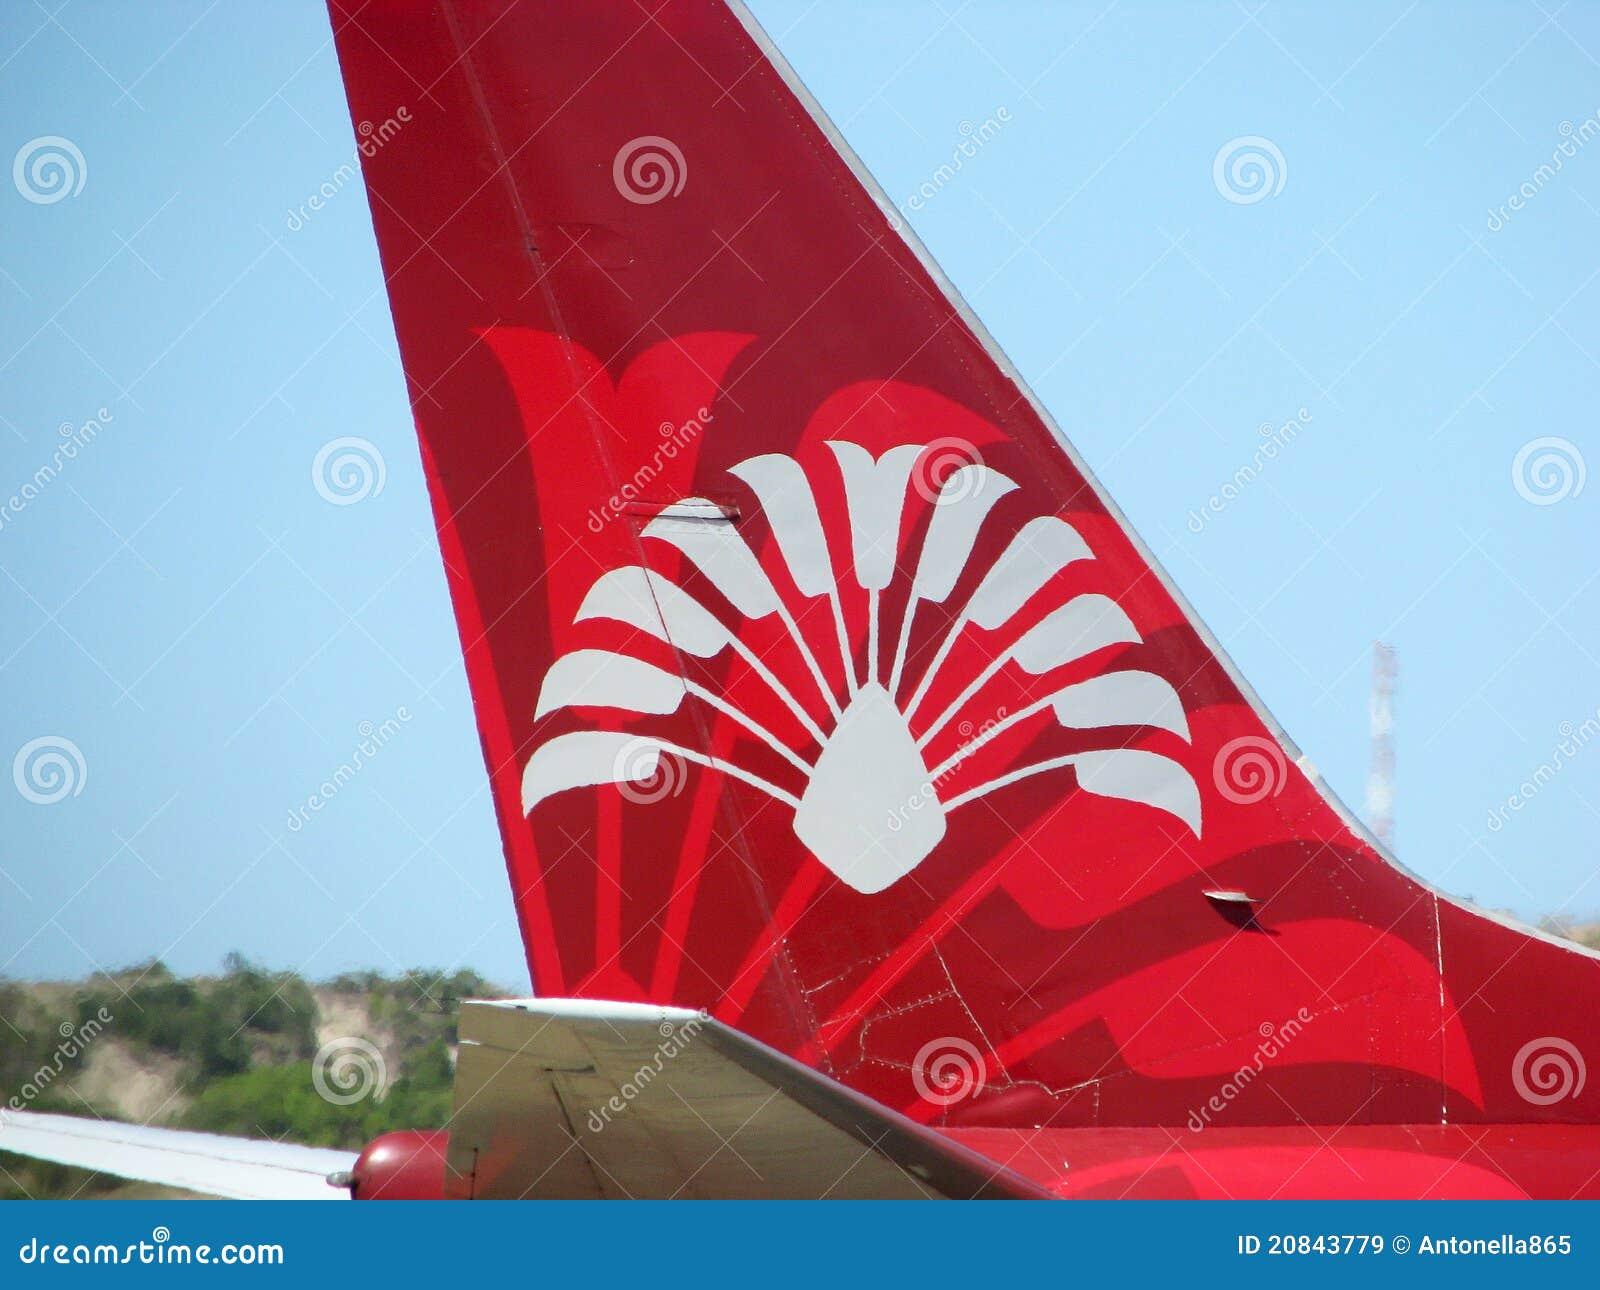 air madagascar logo editorial stock image